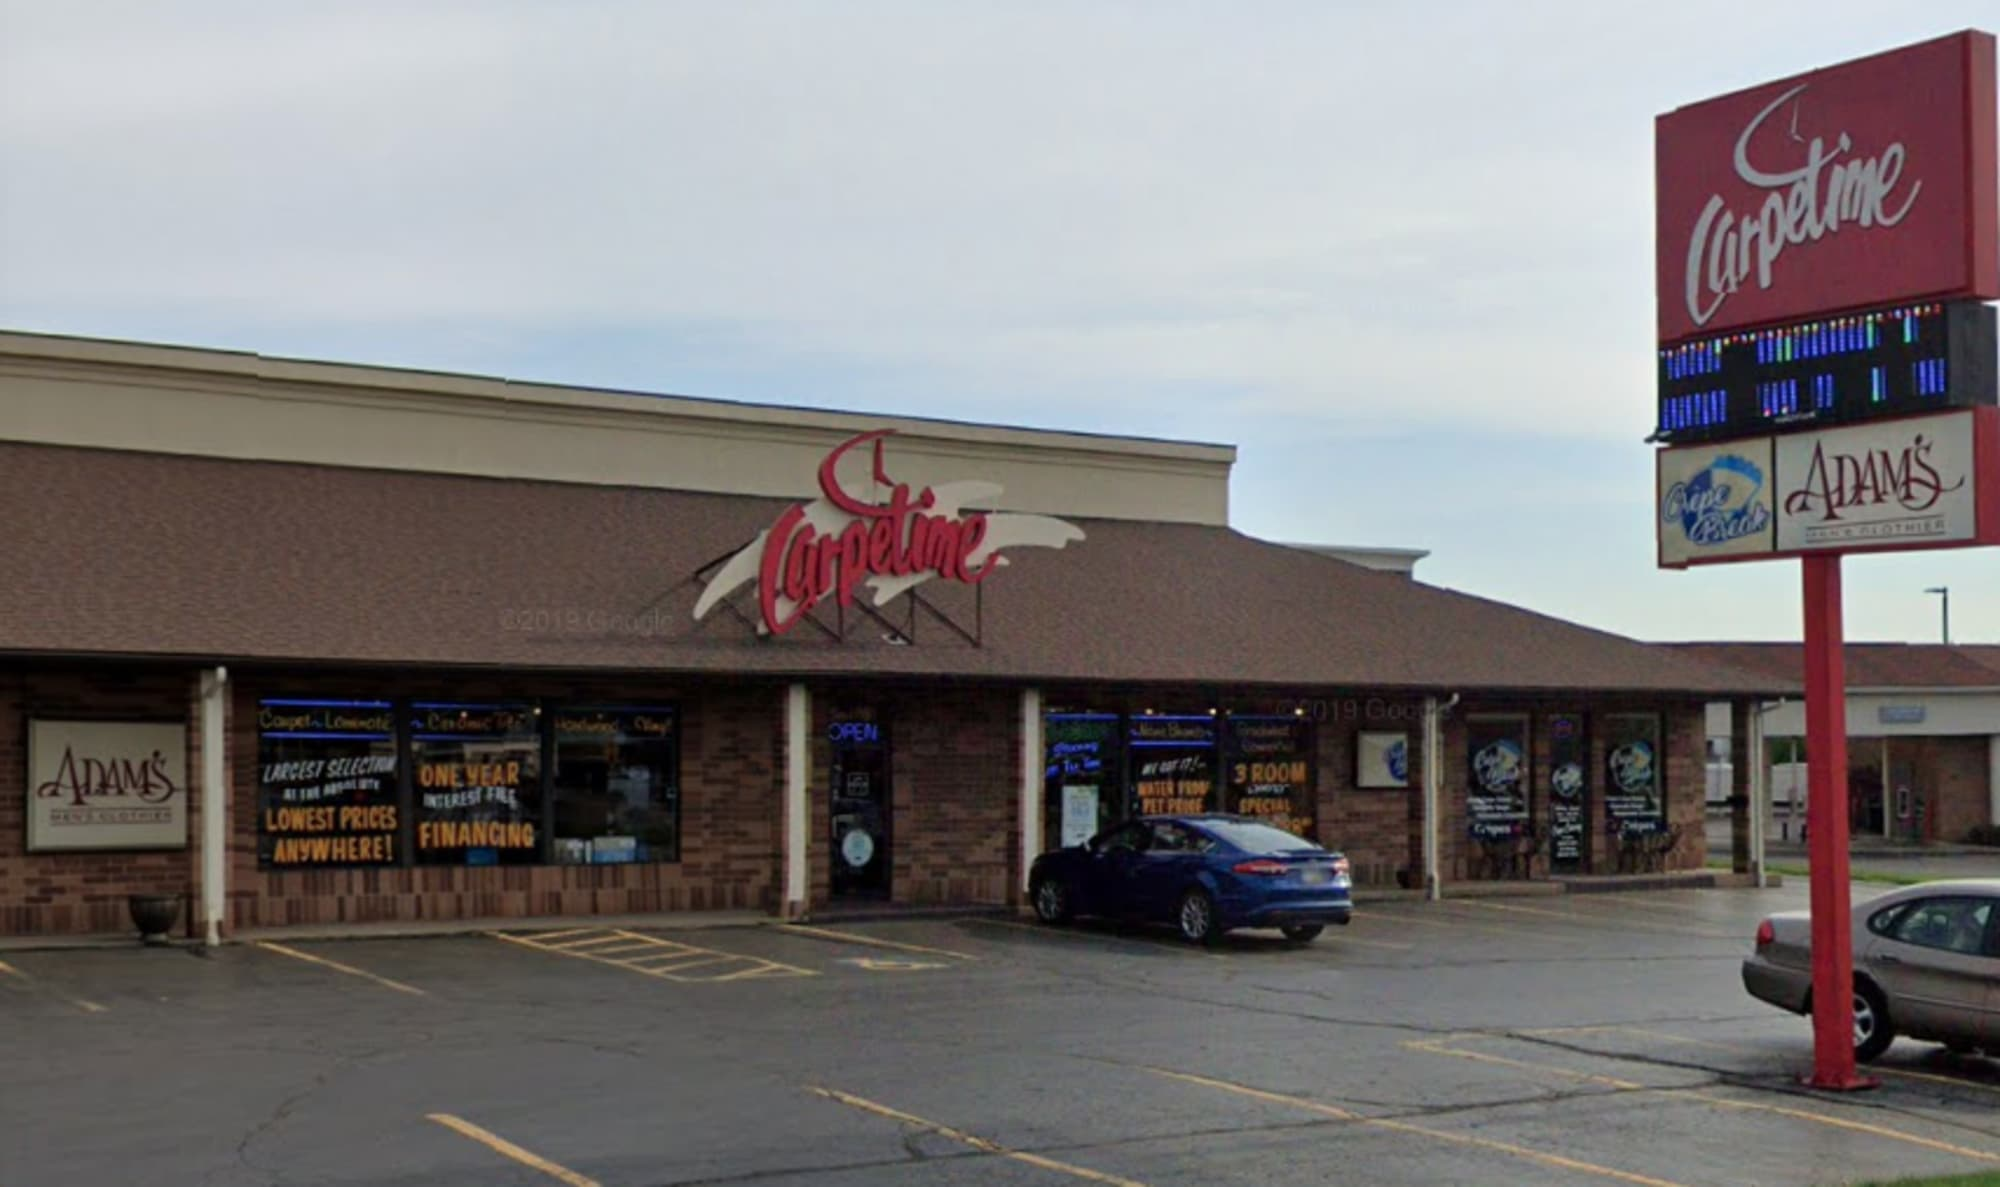 Carpetime Inc - 4595 Belden Village St NW Canton, OH 44718